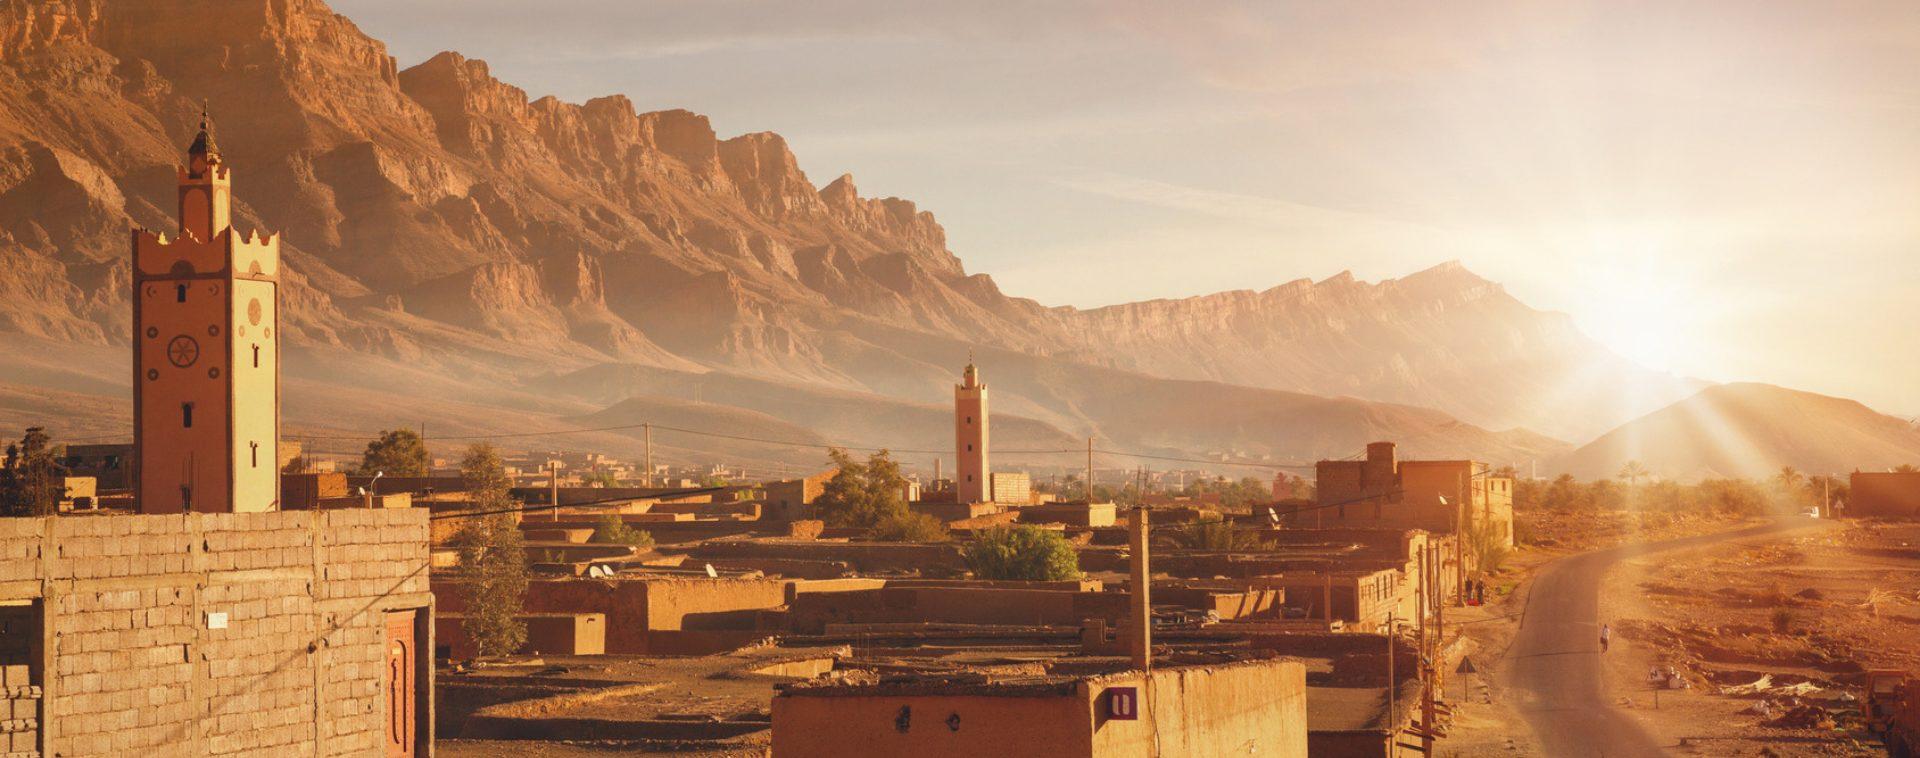 Maroc - Les Matins du Monde